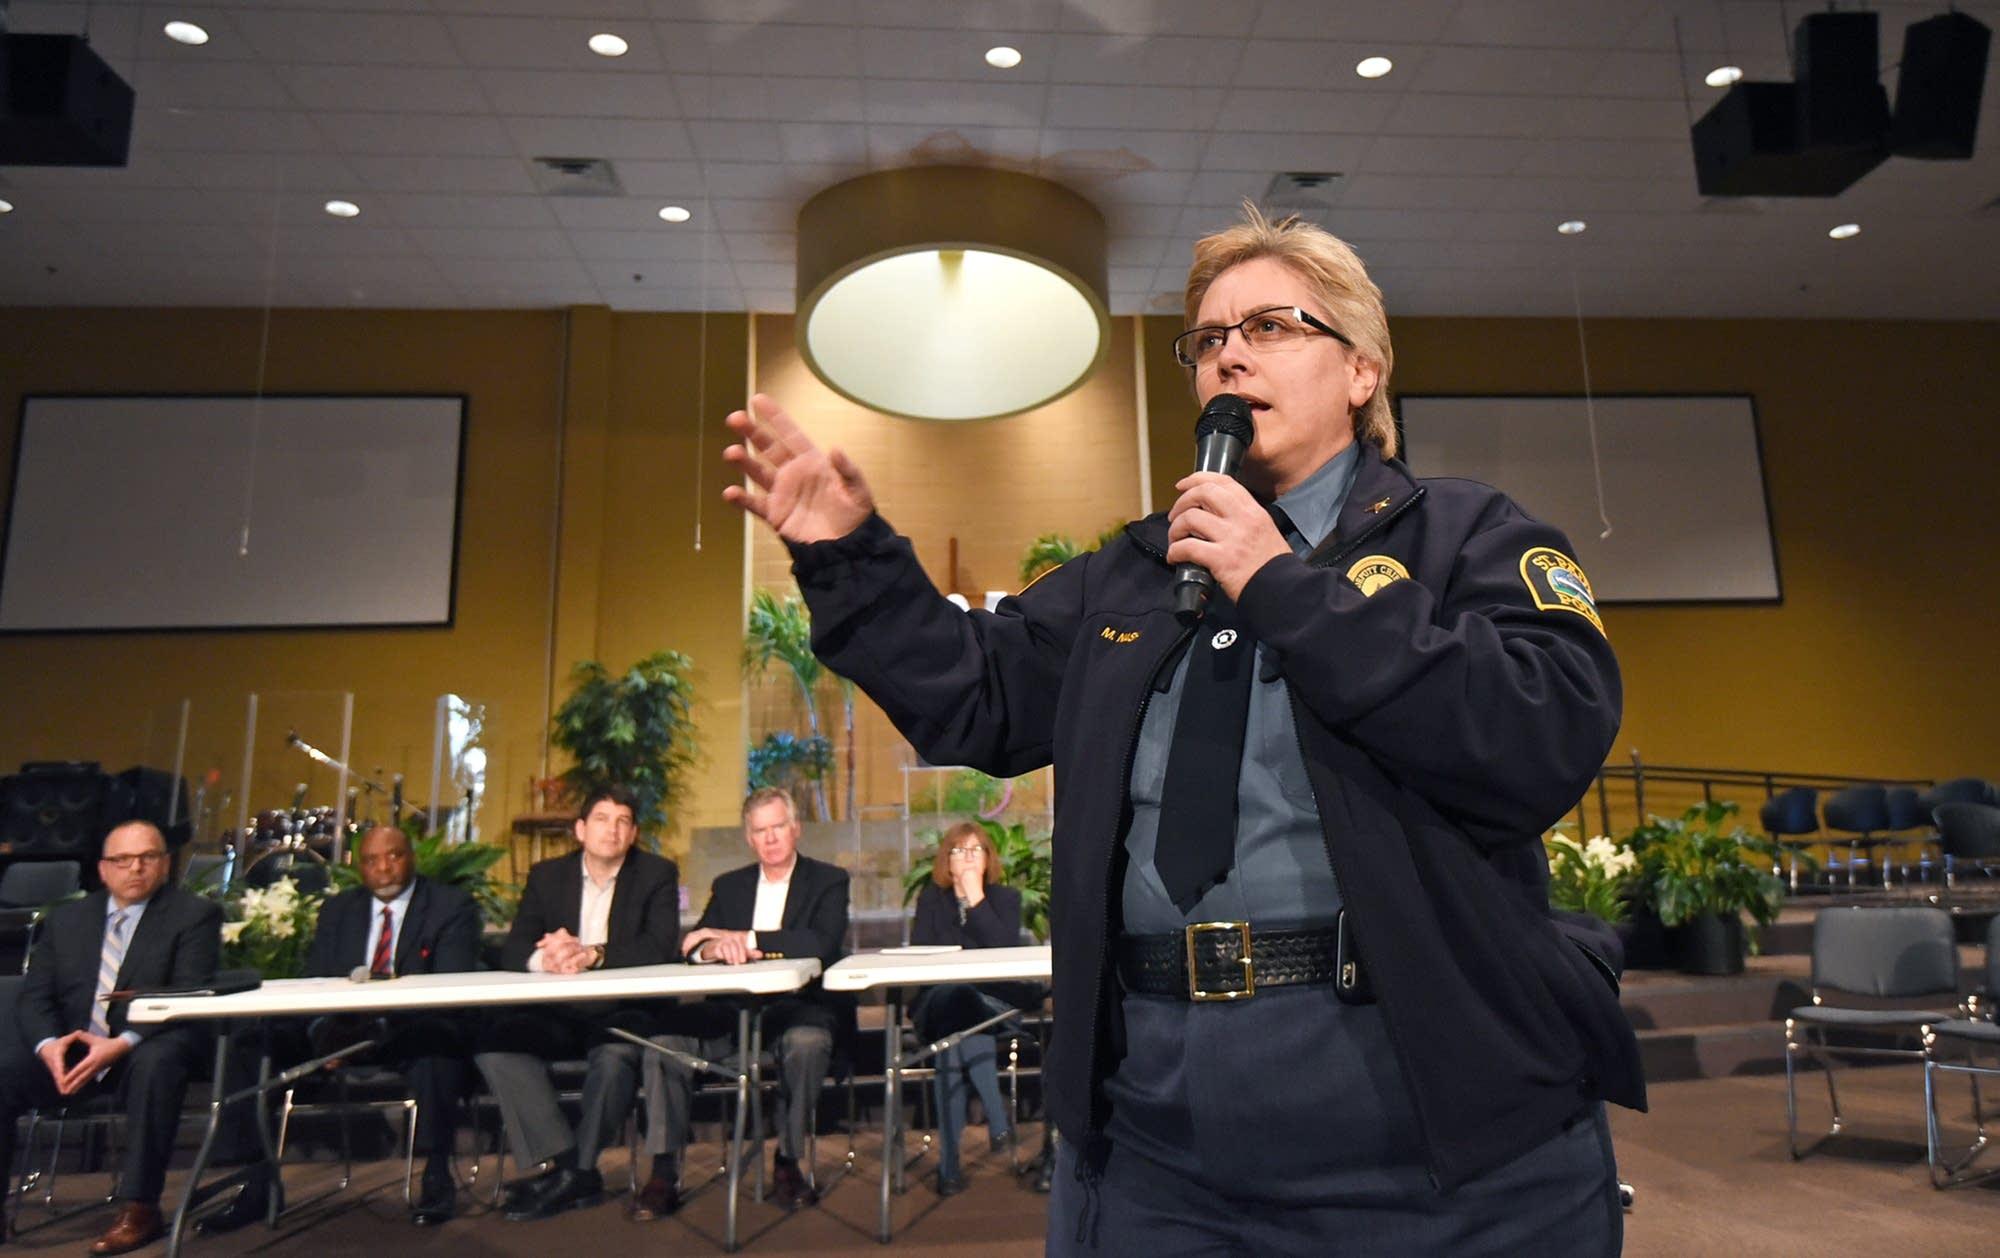 St. Paul Police Deputy Chief Mary Nash